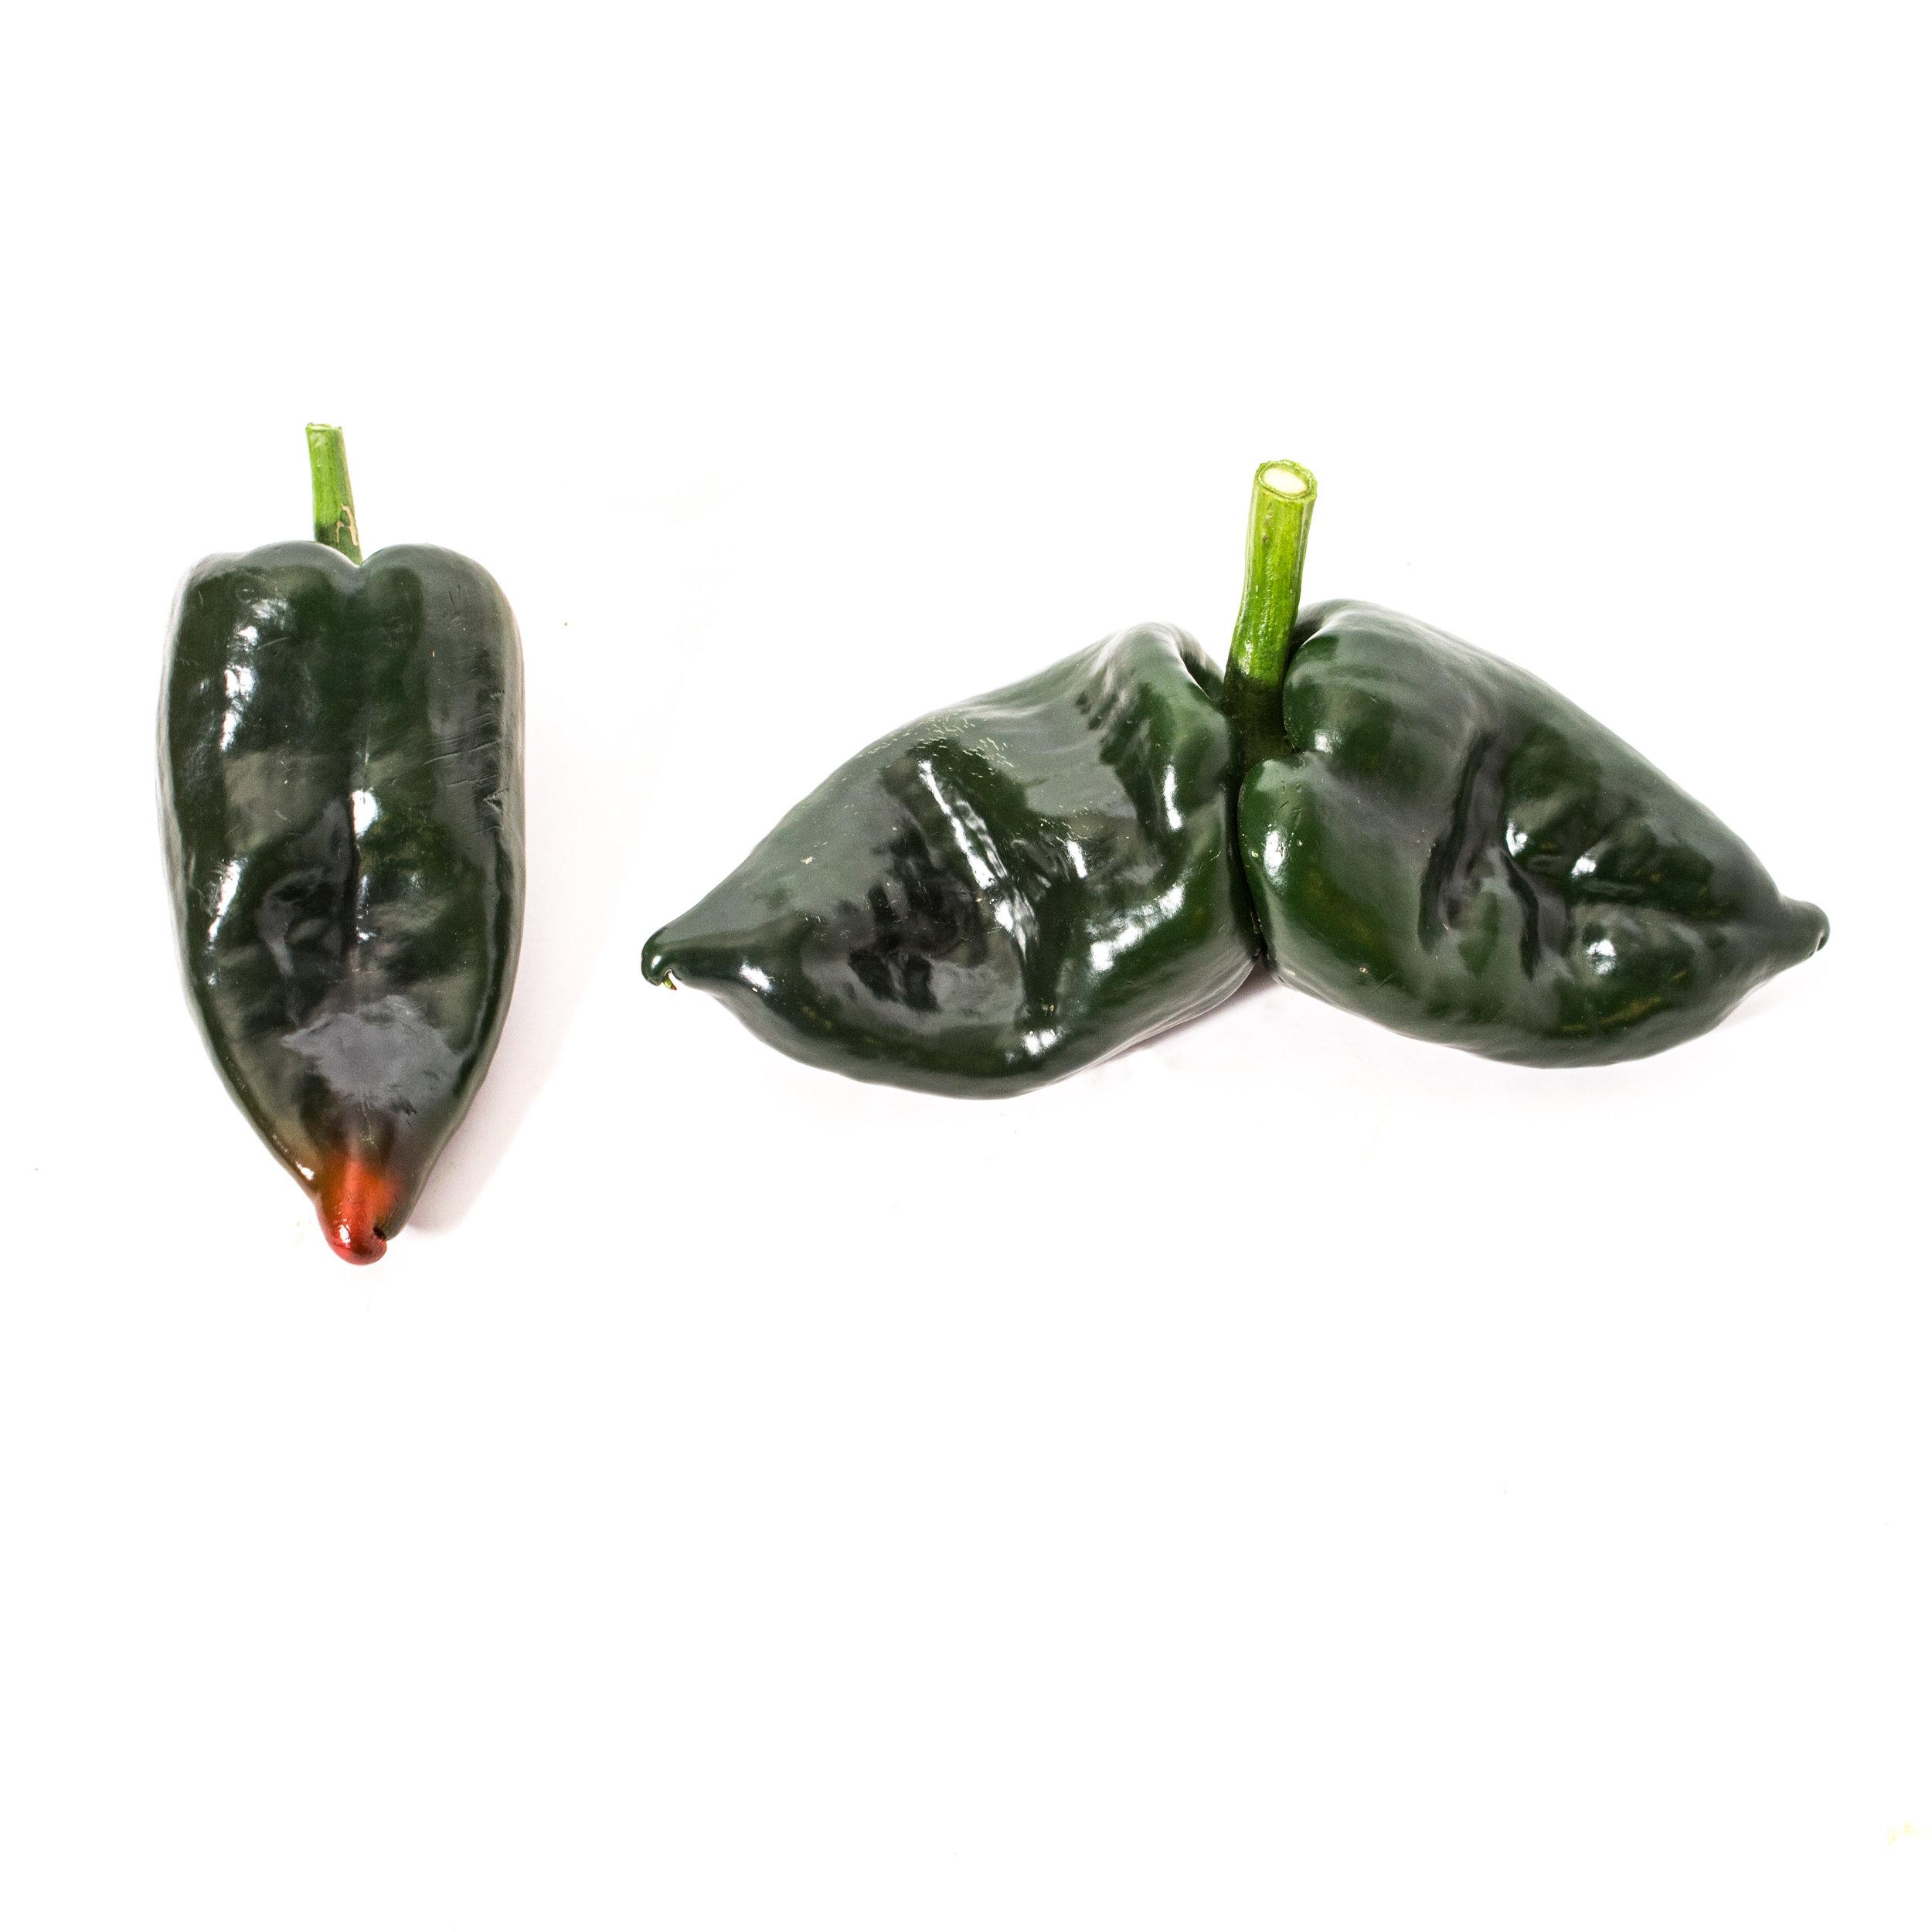 BOTH IMPERFECT Poblano Pepper .jpg